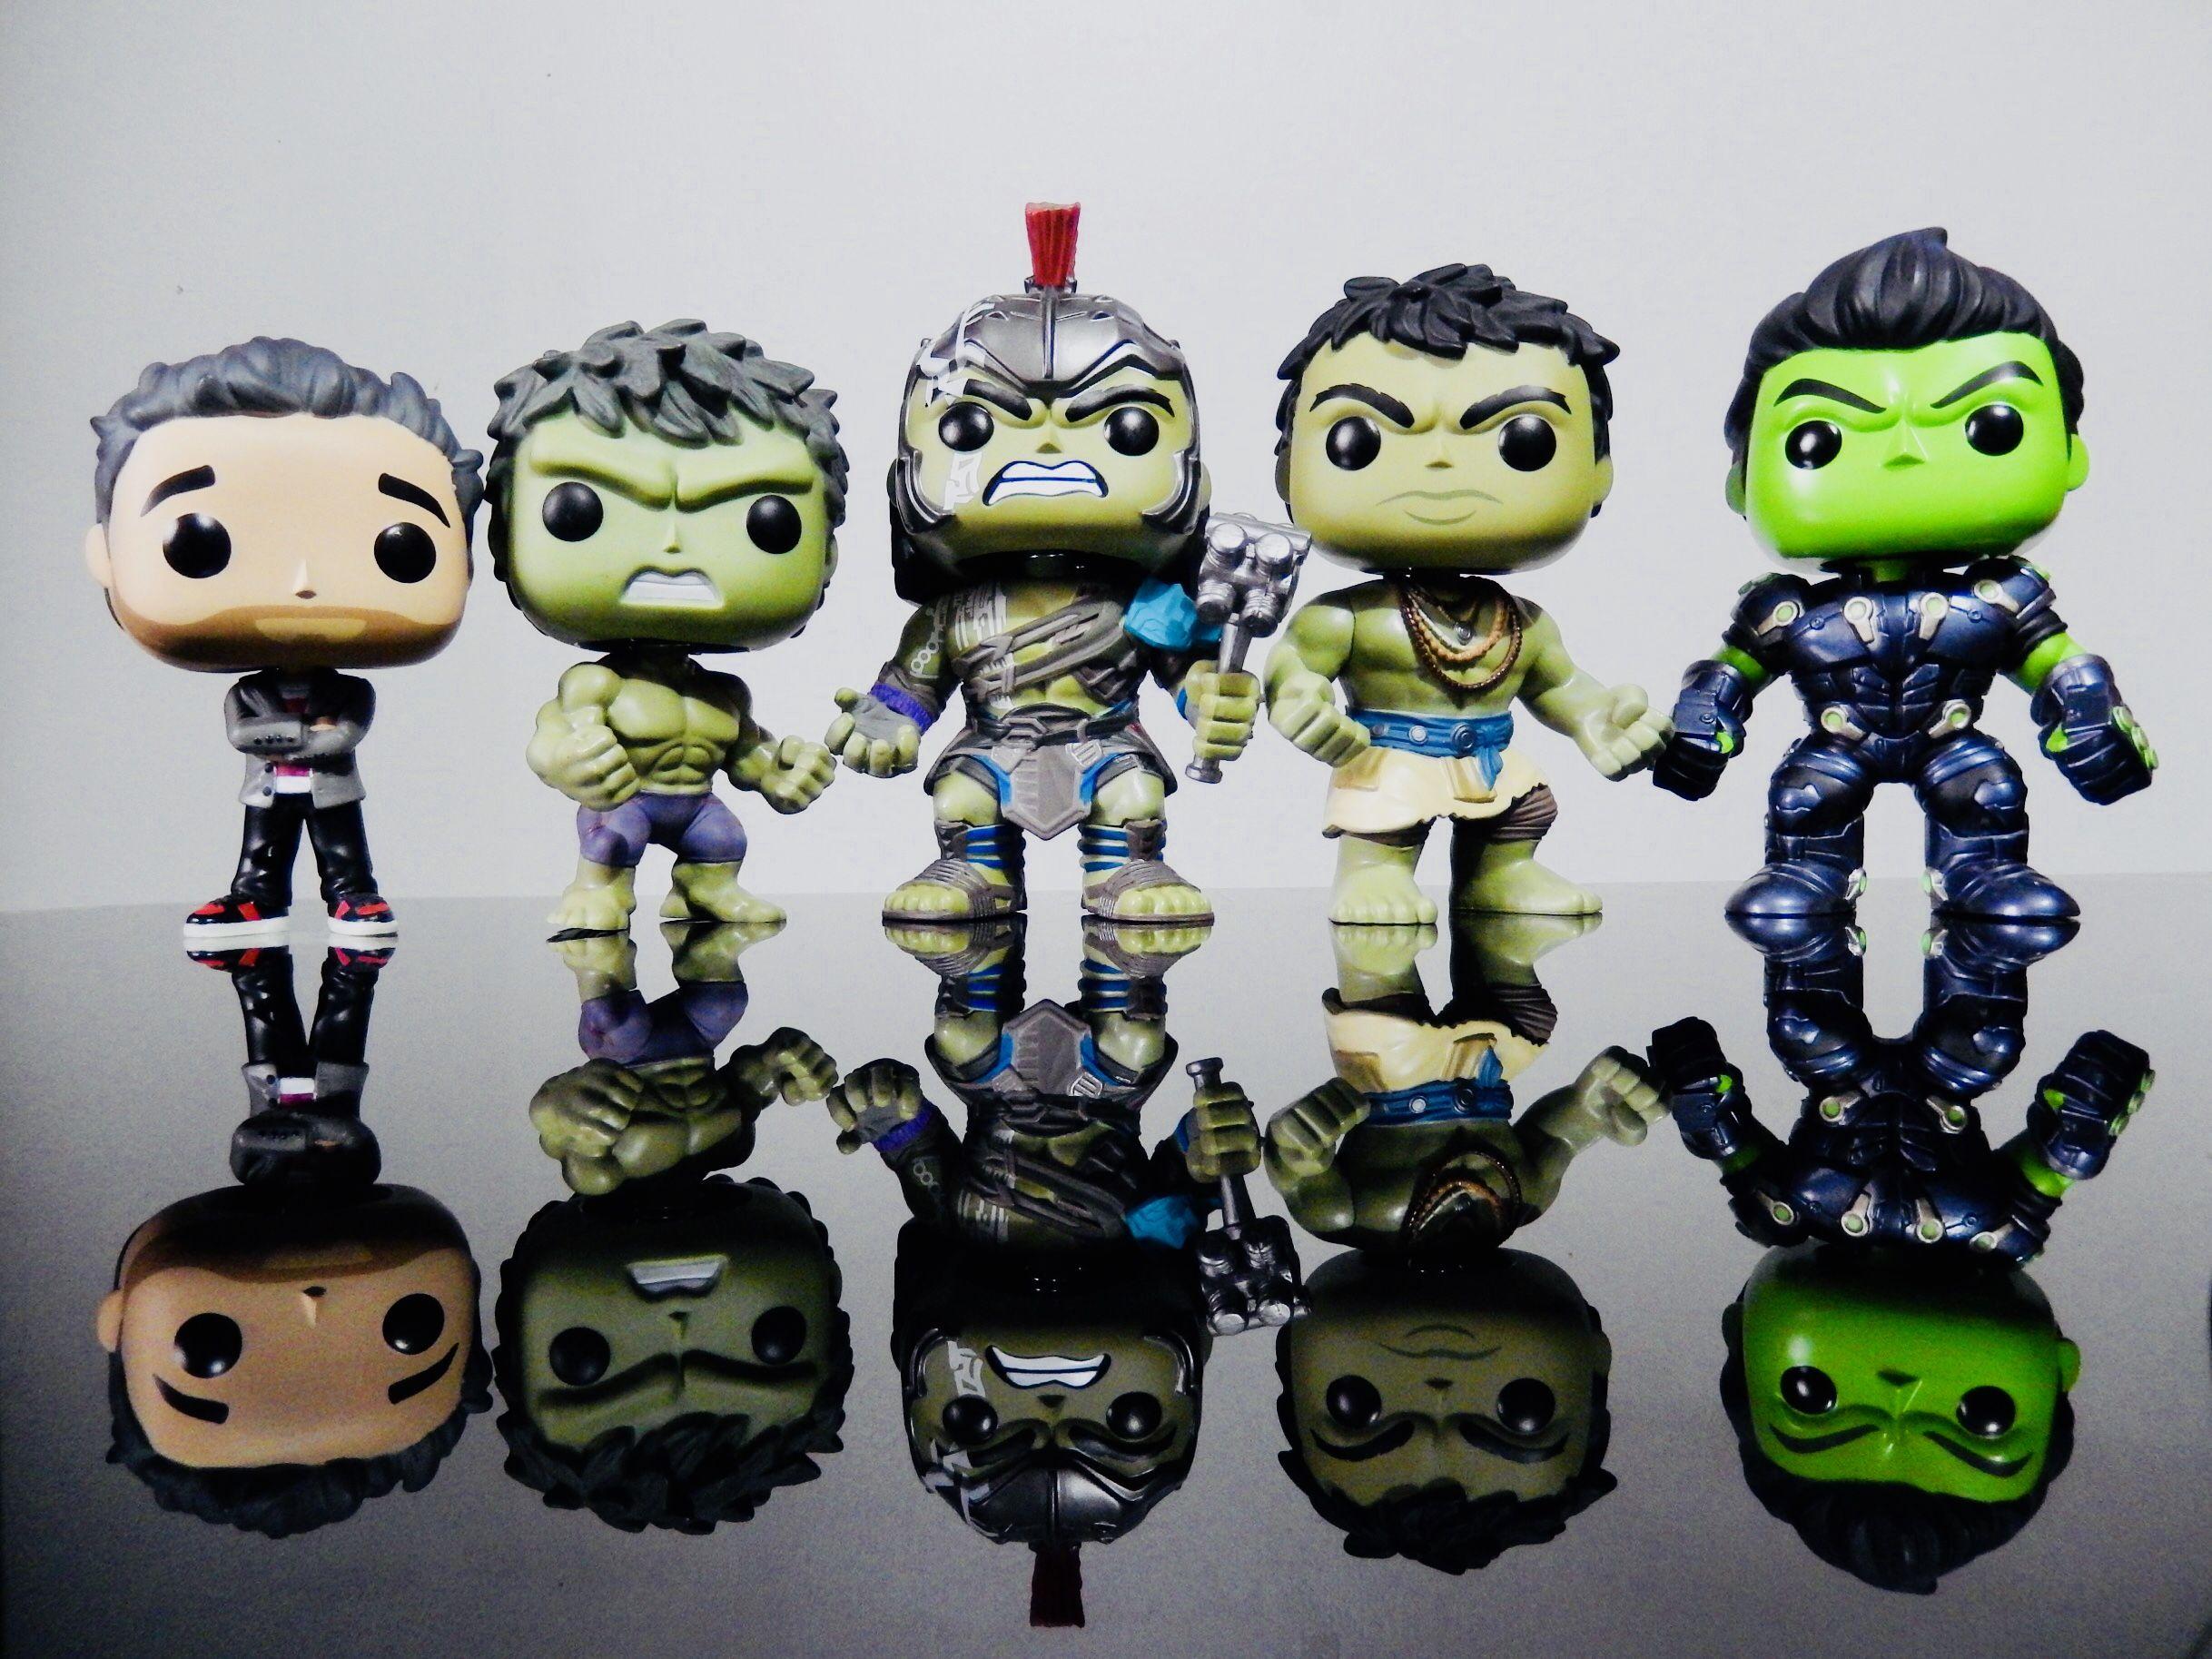 Hulk Funko Pop Funko Pop Dolls Pop Dolls Funko